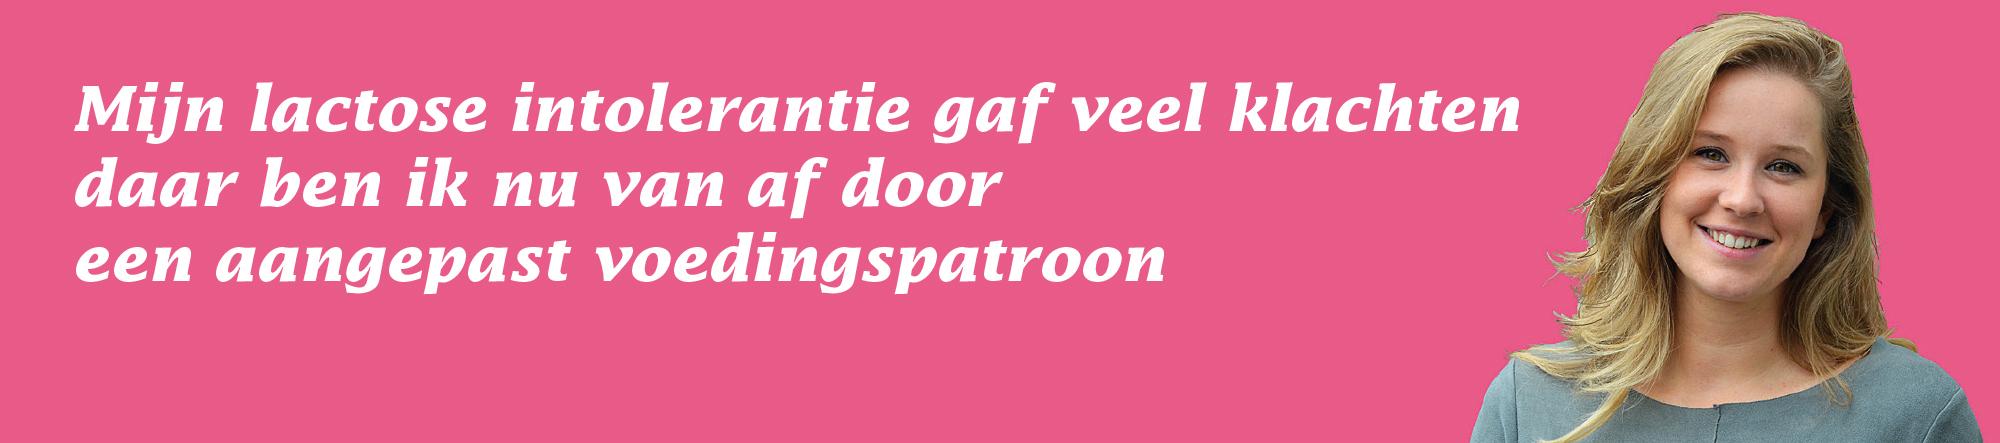 http://de-dietist.nl/wp-content/uploads/2016/09/de-dietist-quote-sofieke.jpg